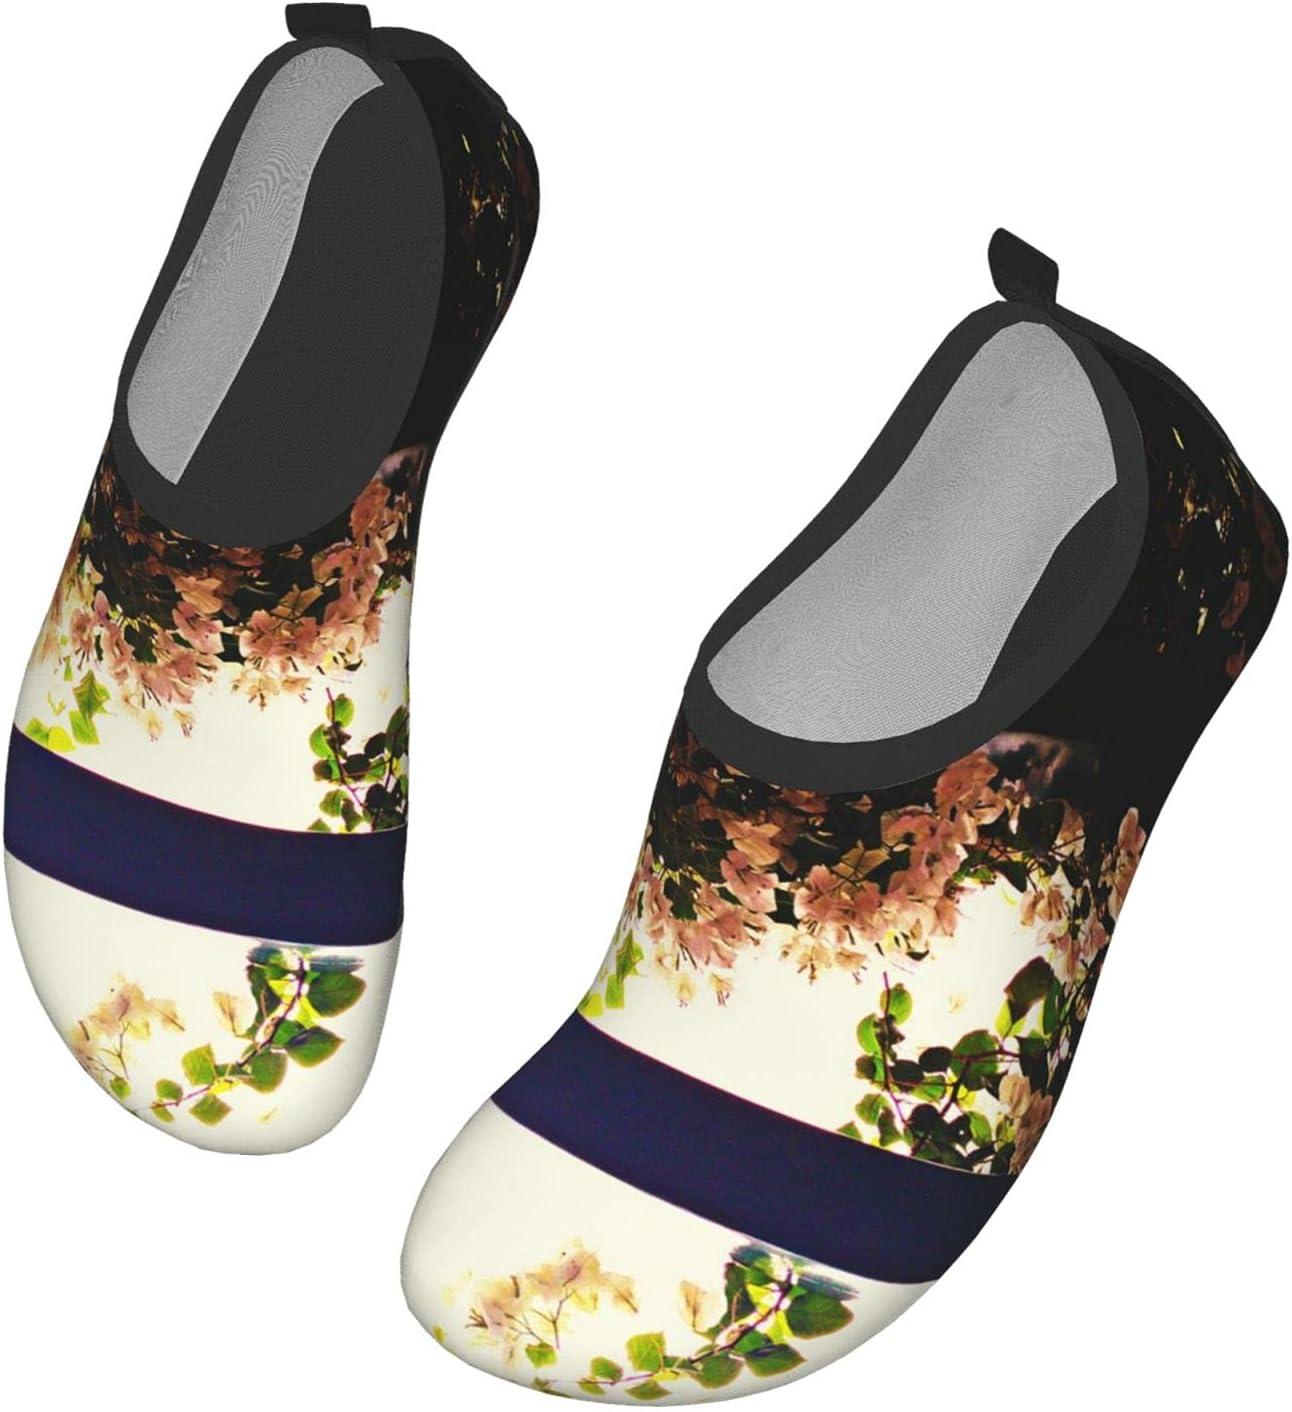 NA Flowers in The Sunset Men's Women's Water Shoes Barefoot Quick Dry Slip-On Aqua Socks for Yoga Beach Sports Swim Surf